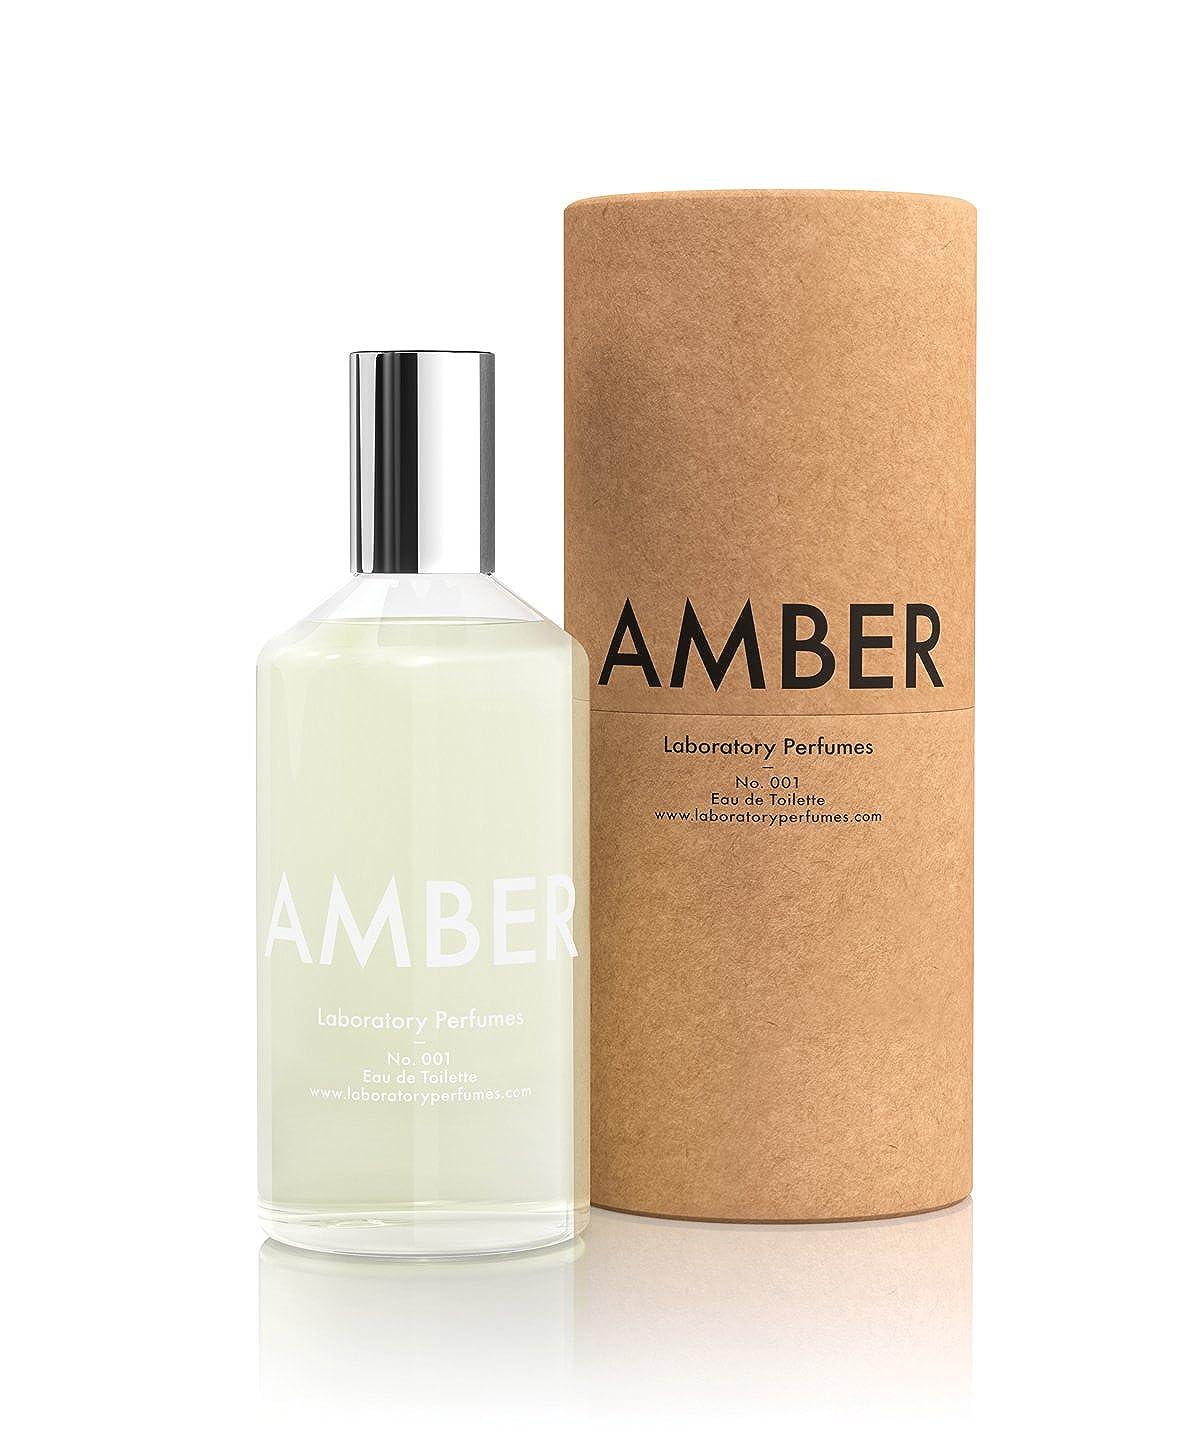 Laboratory Perfumes Amber Eau de Toillette Laboratory Perfumes Ltd